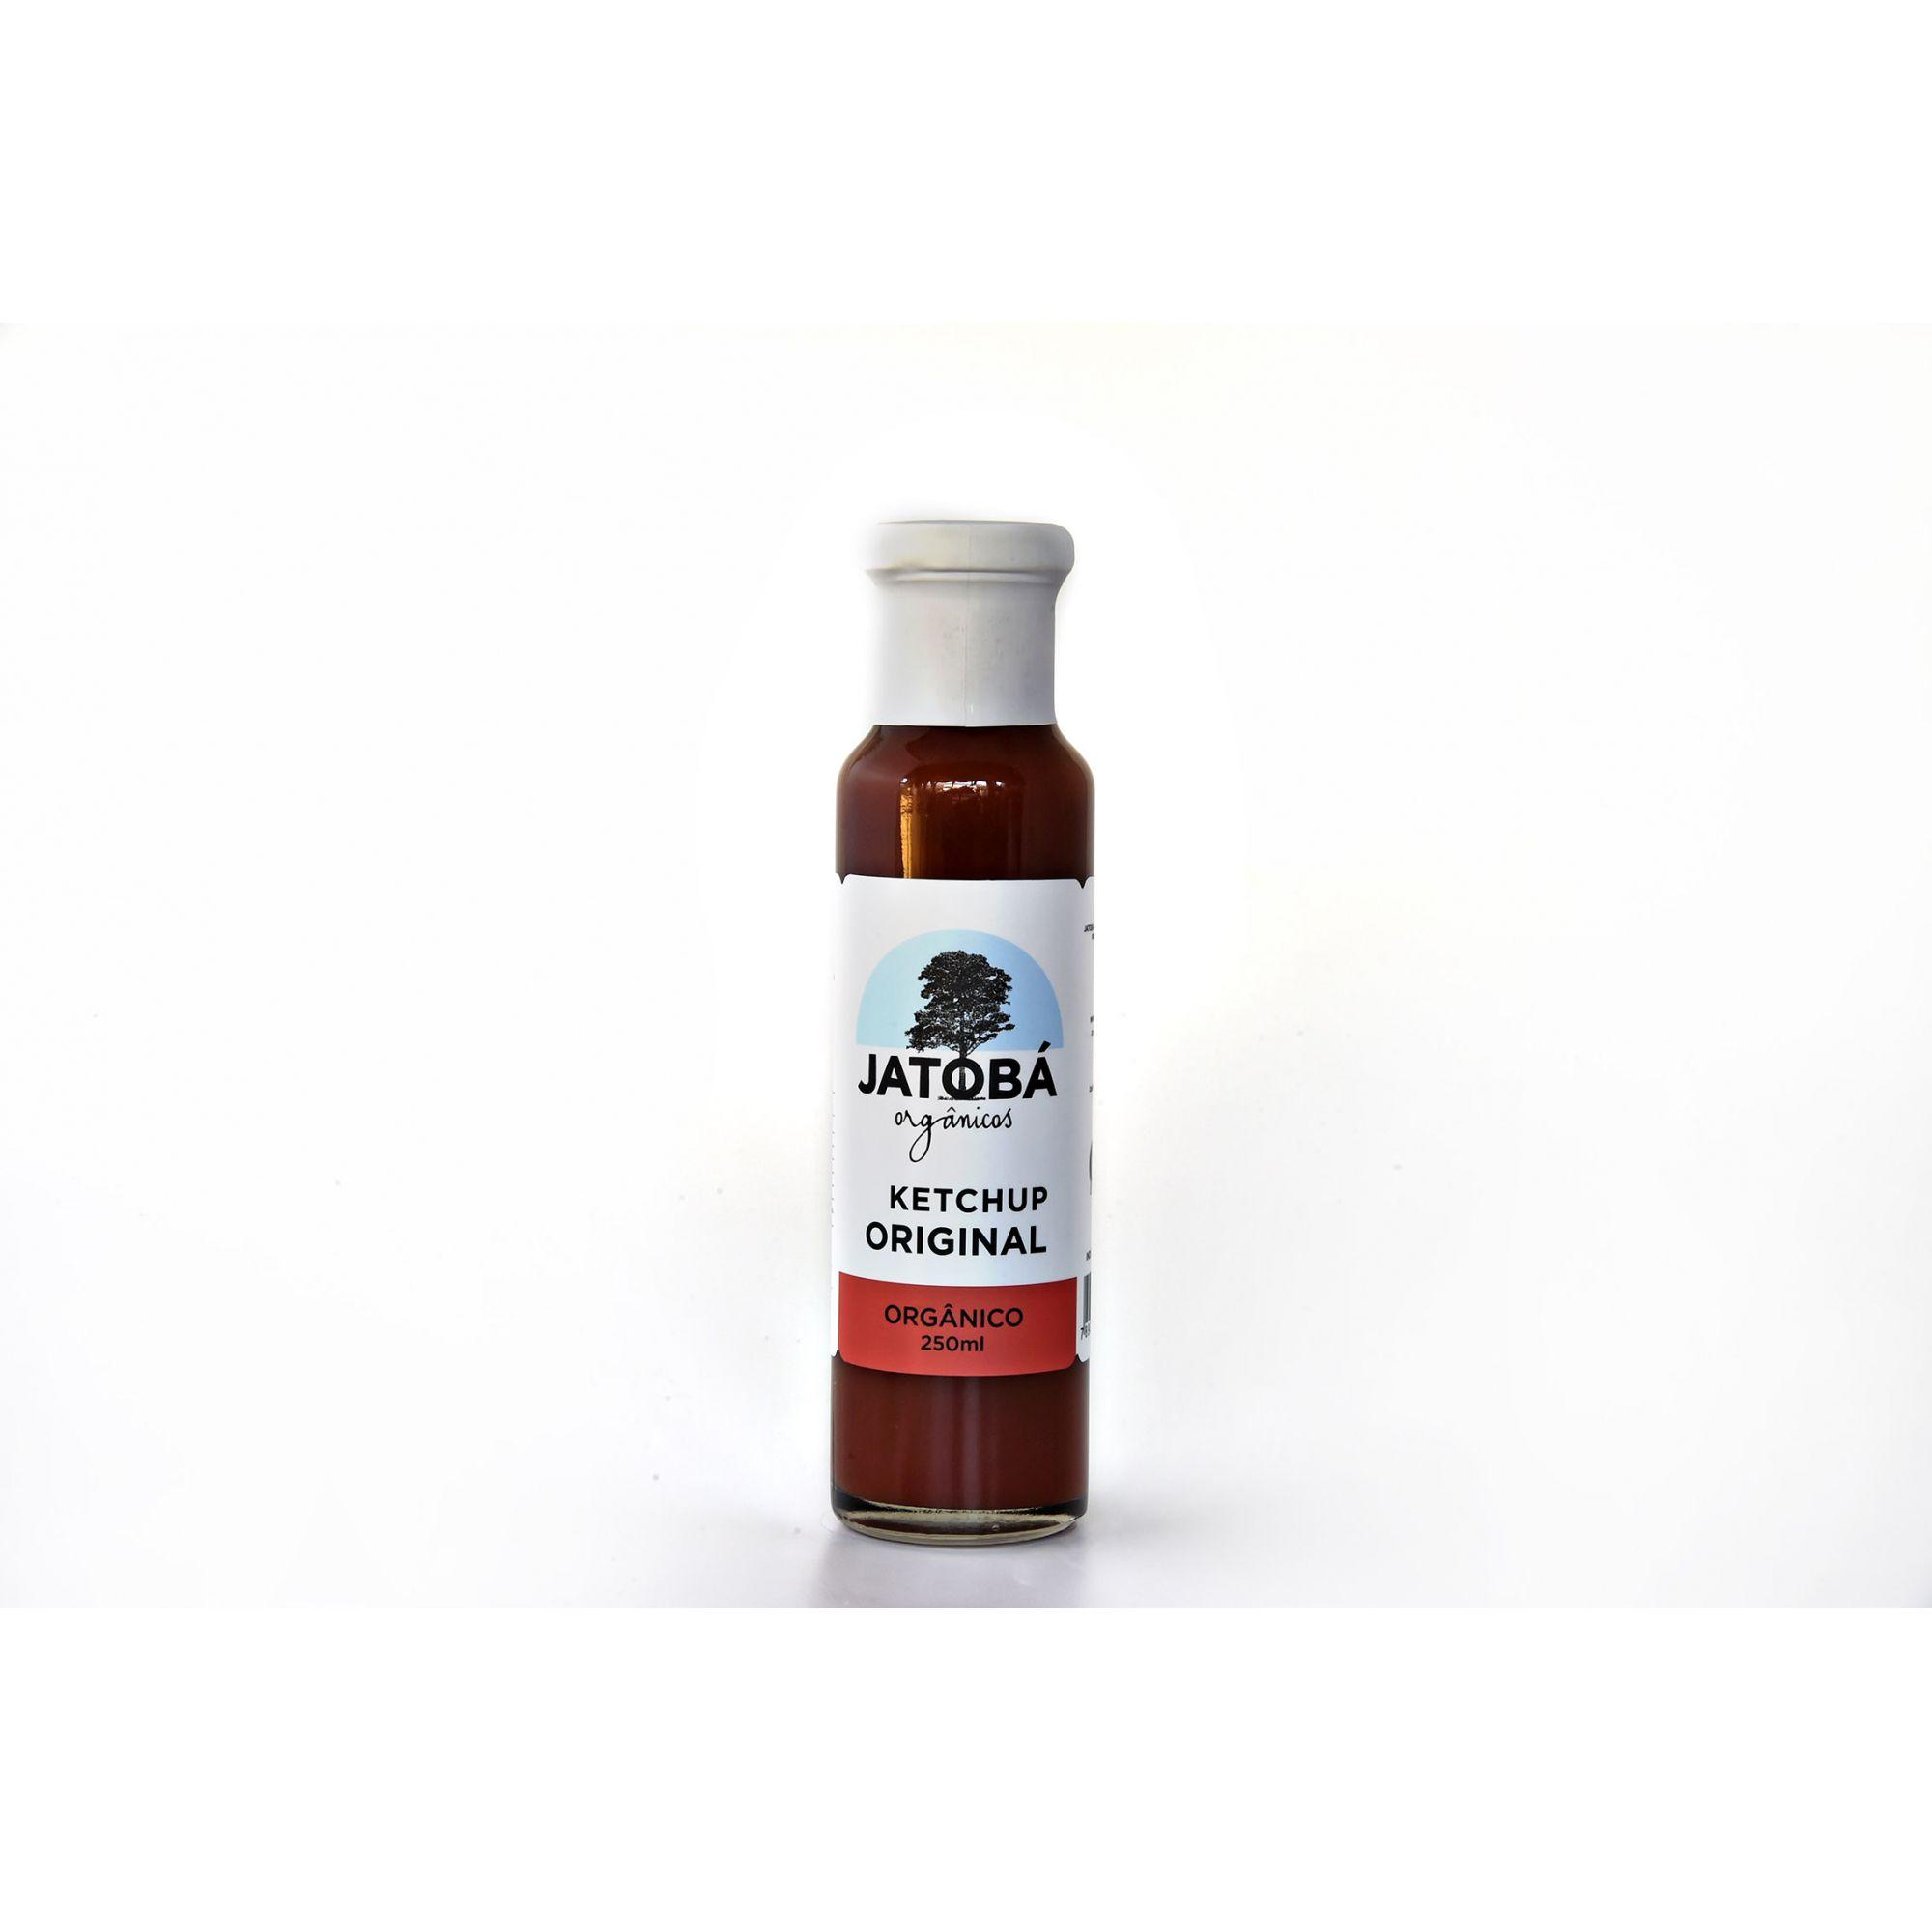 Ketchup Orgânico 250ml - Jatobá